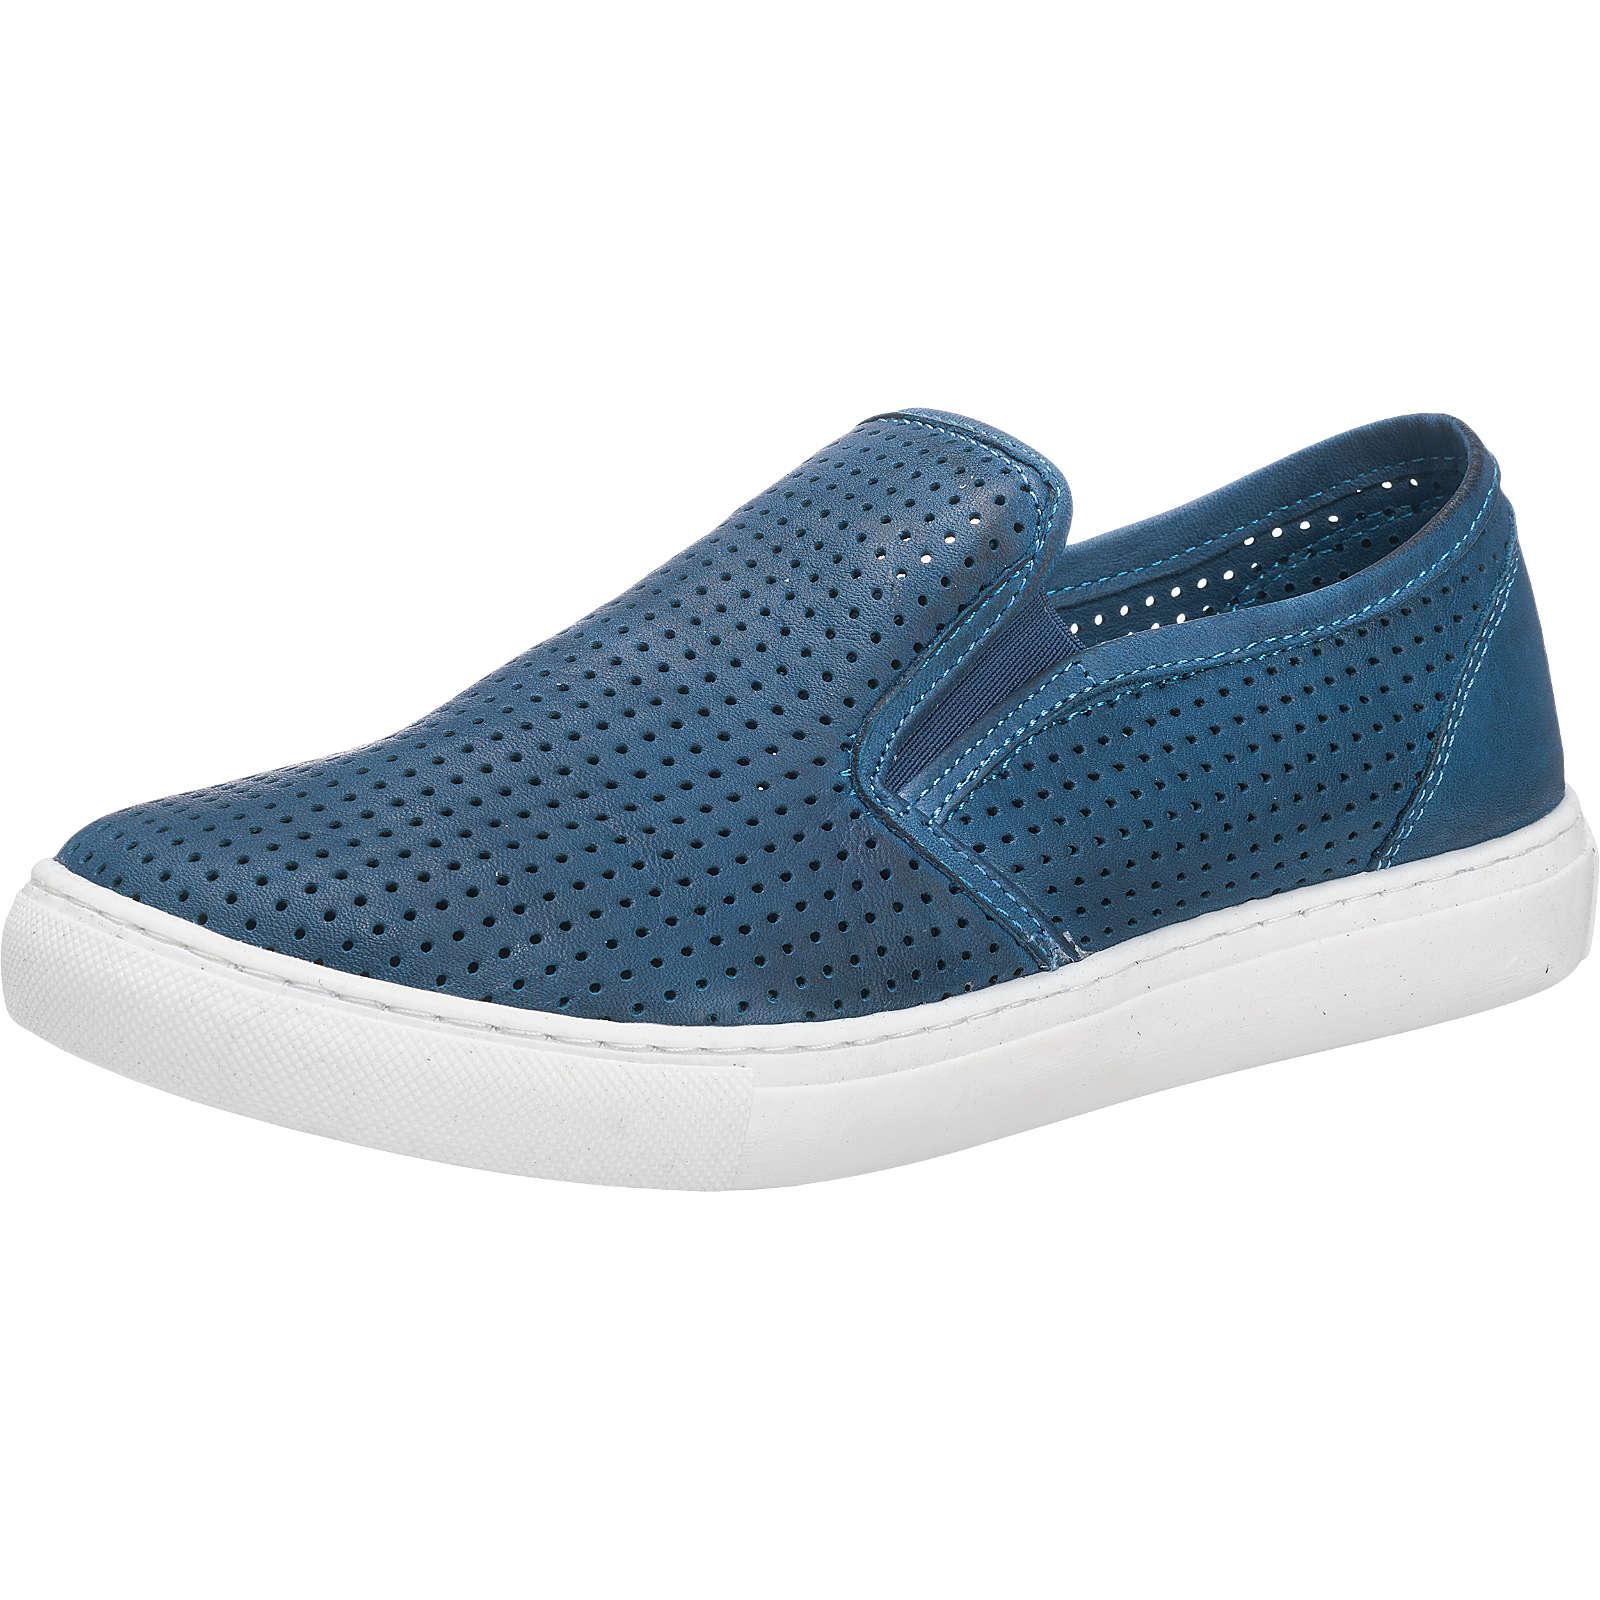 Andrea Conti Sneakers blau Damen Gr. 38 jetztbilligerkaufen